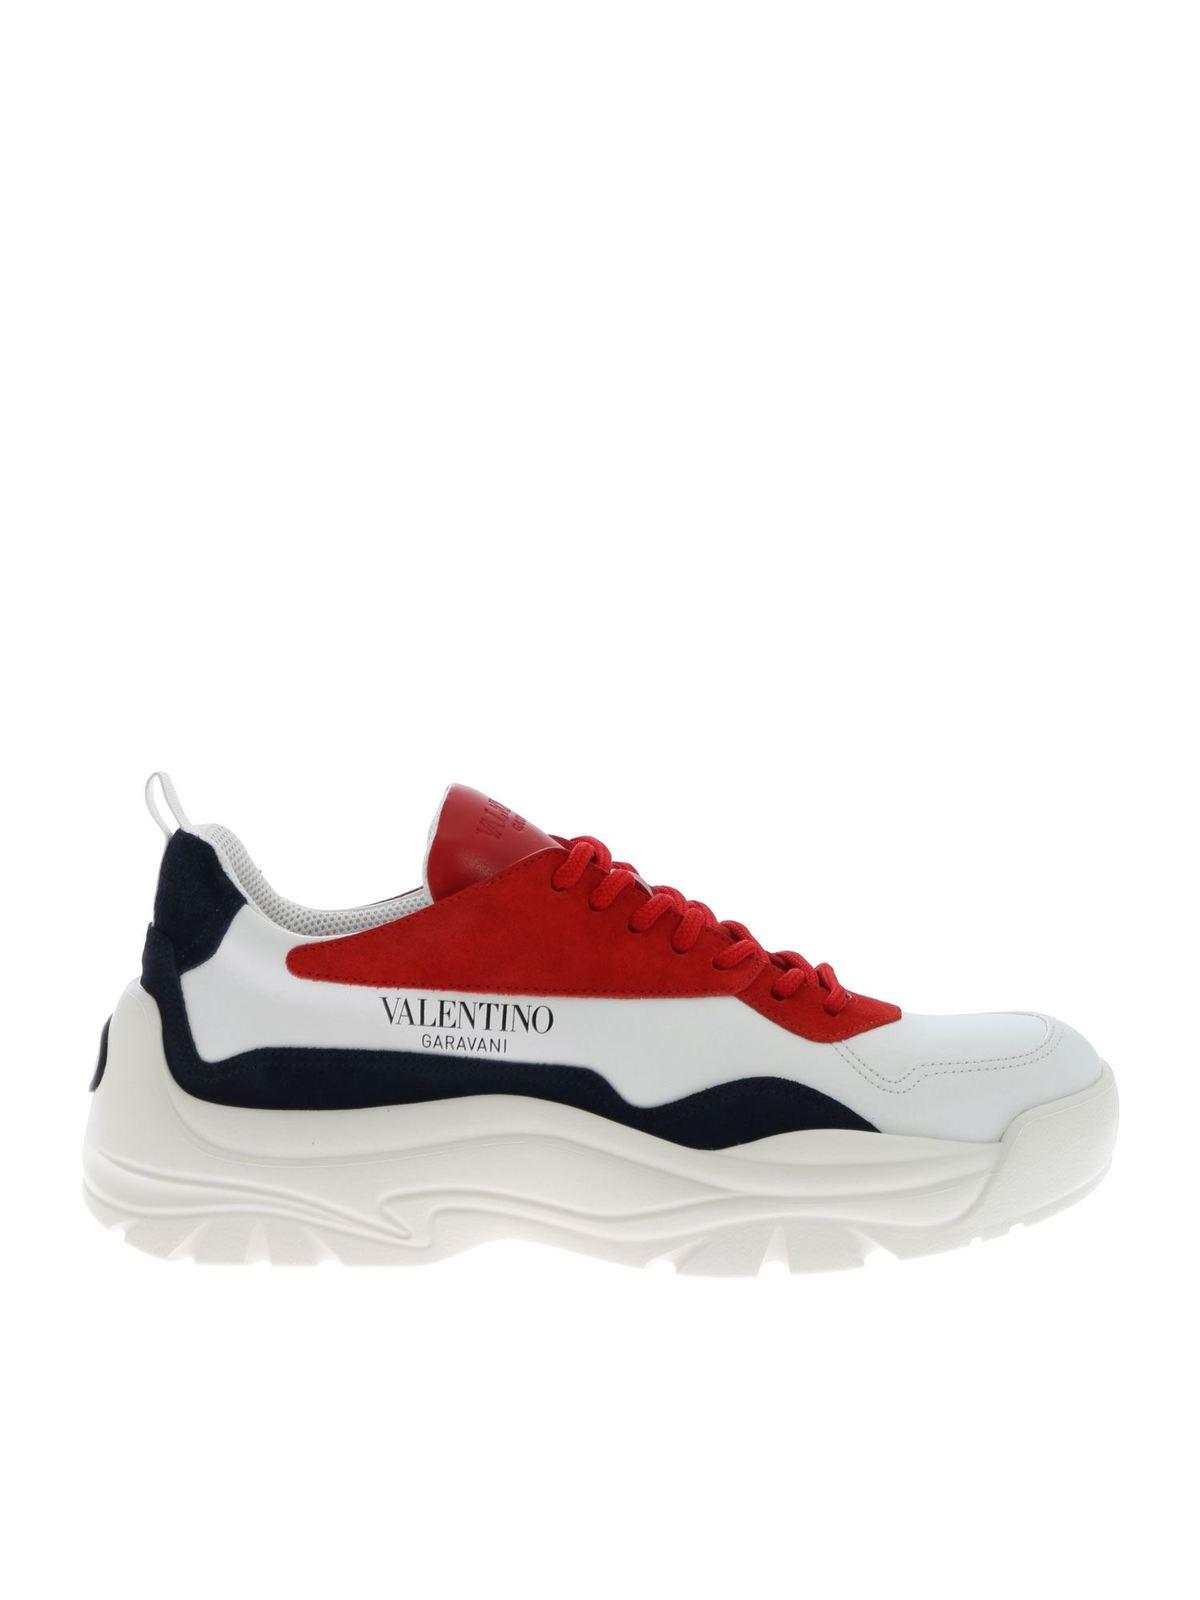 Valentino Garavani - Chunky sneakers